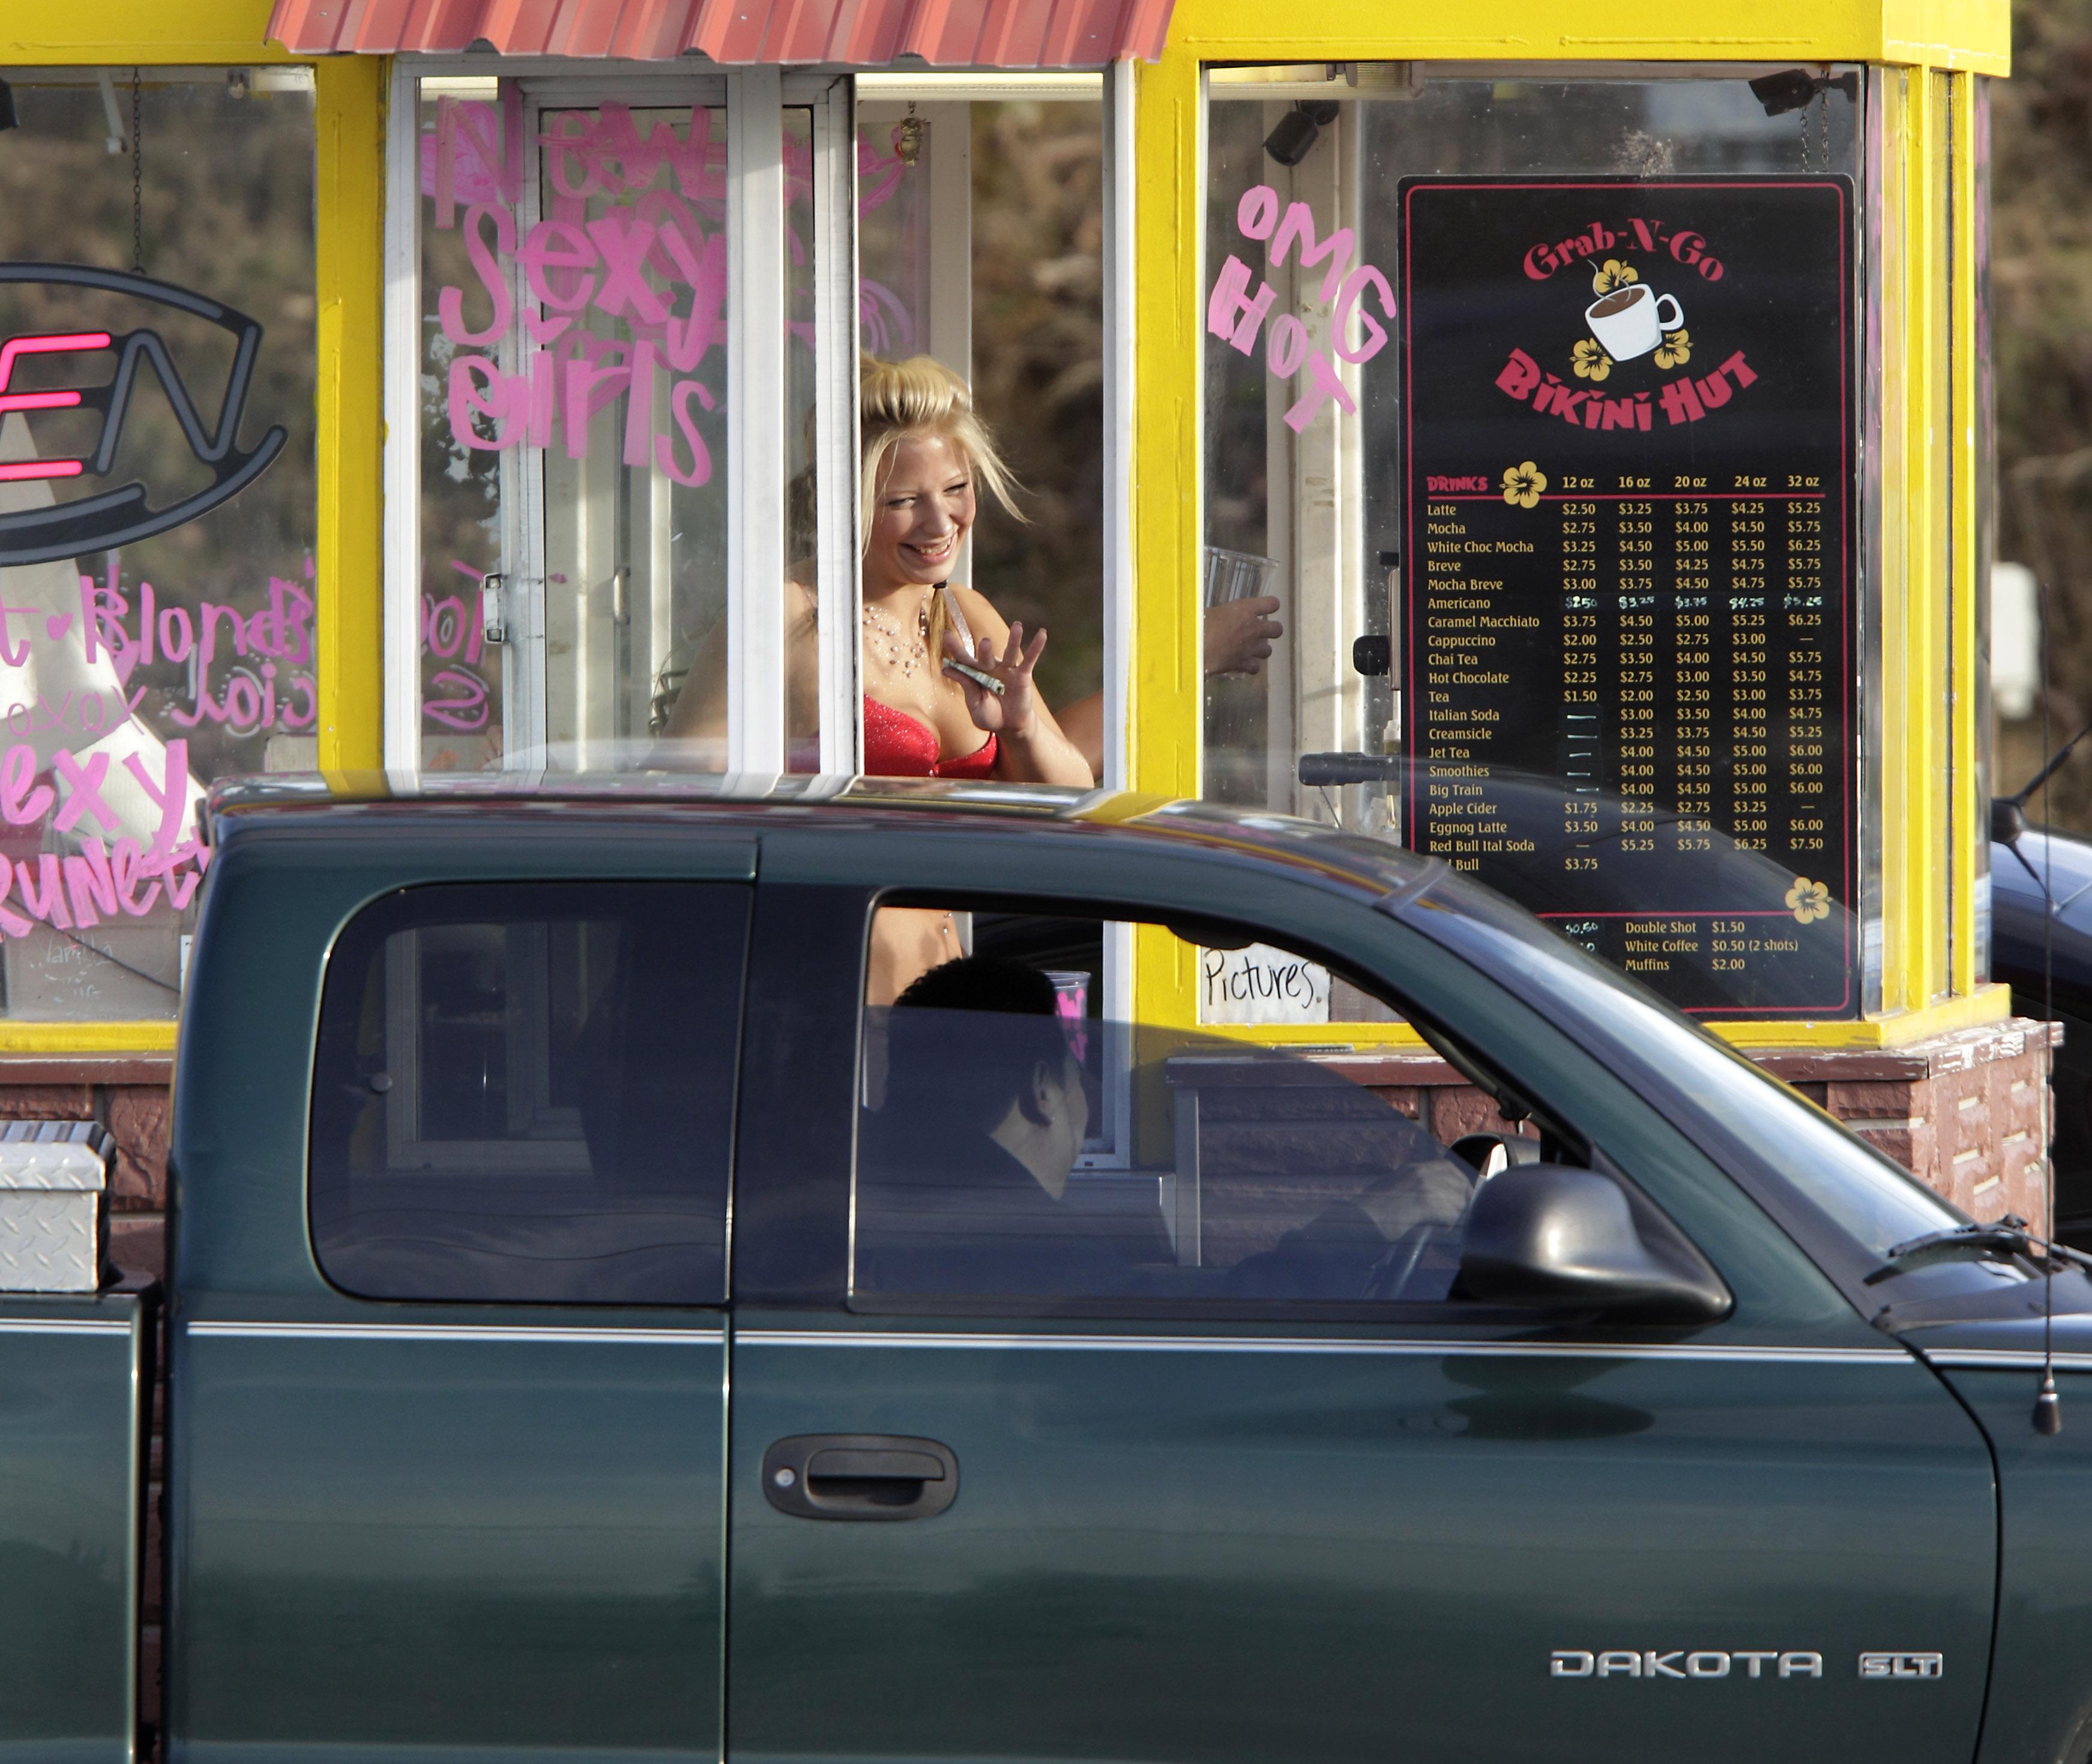 Everett washington bikini cooffe drive through